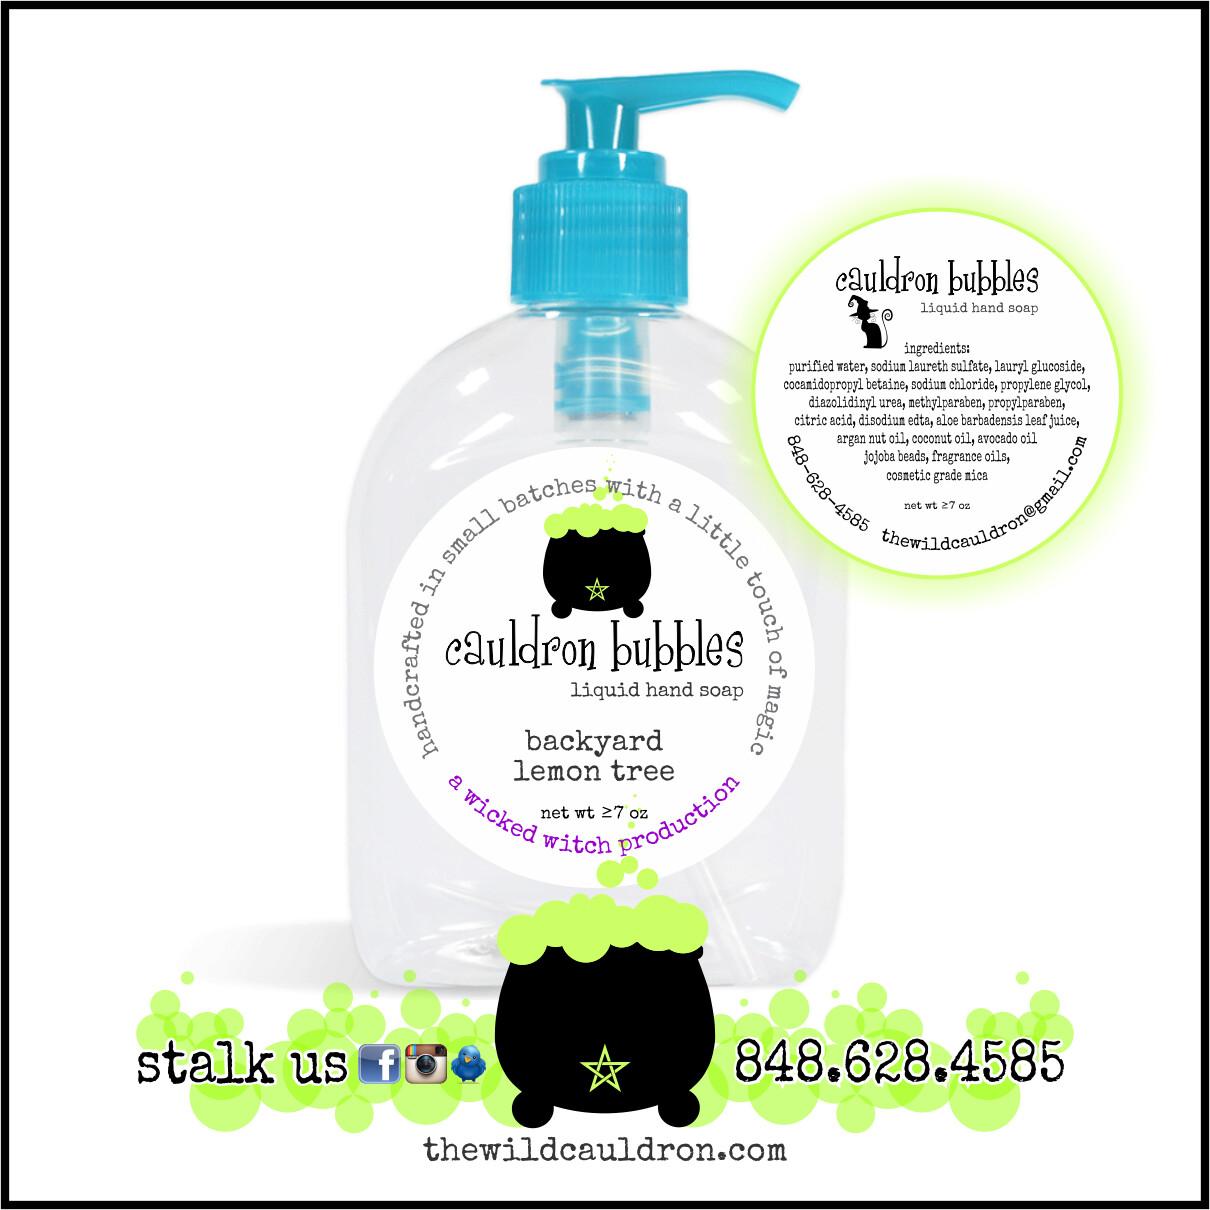 Backyard Lemon Tree Cauldron Bubbles Hand Soap